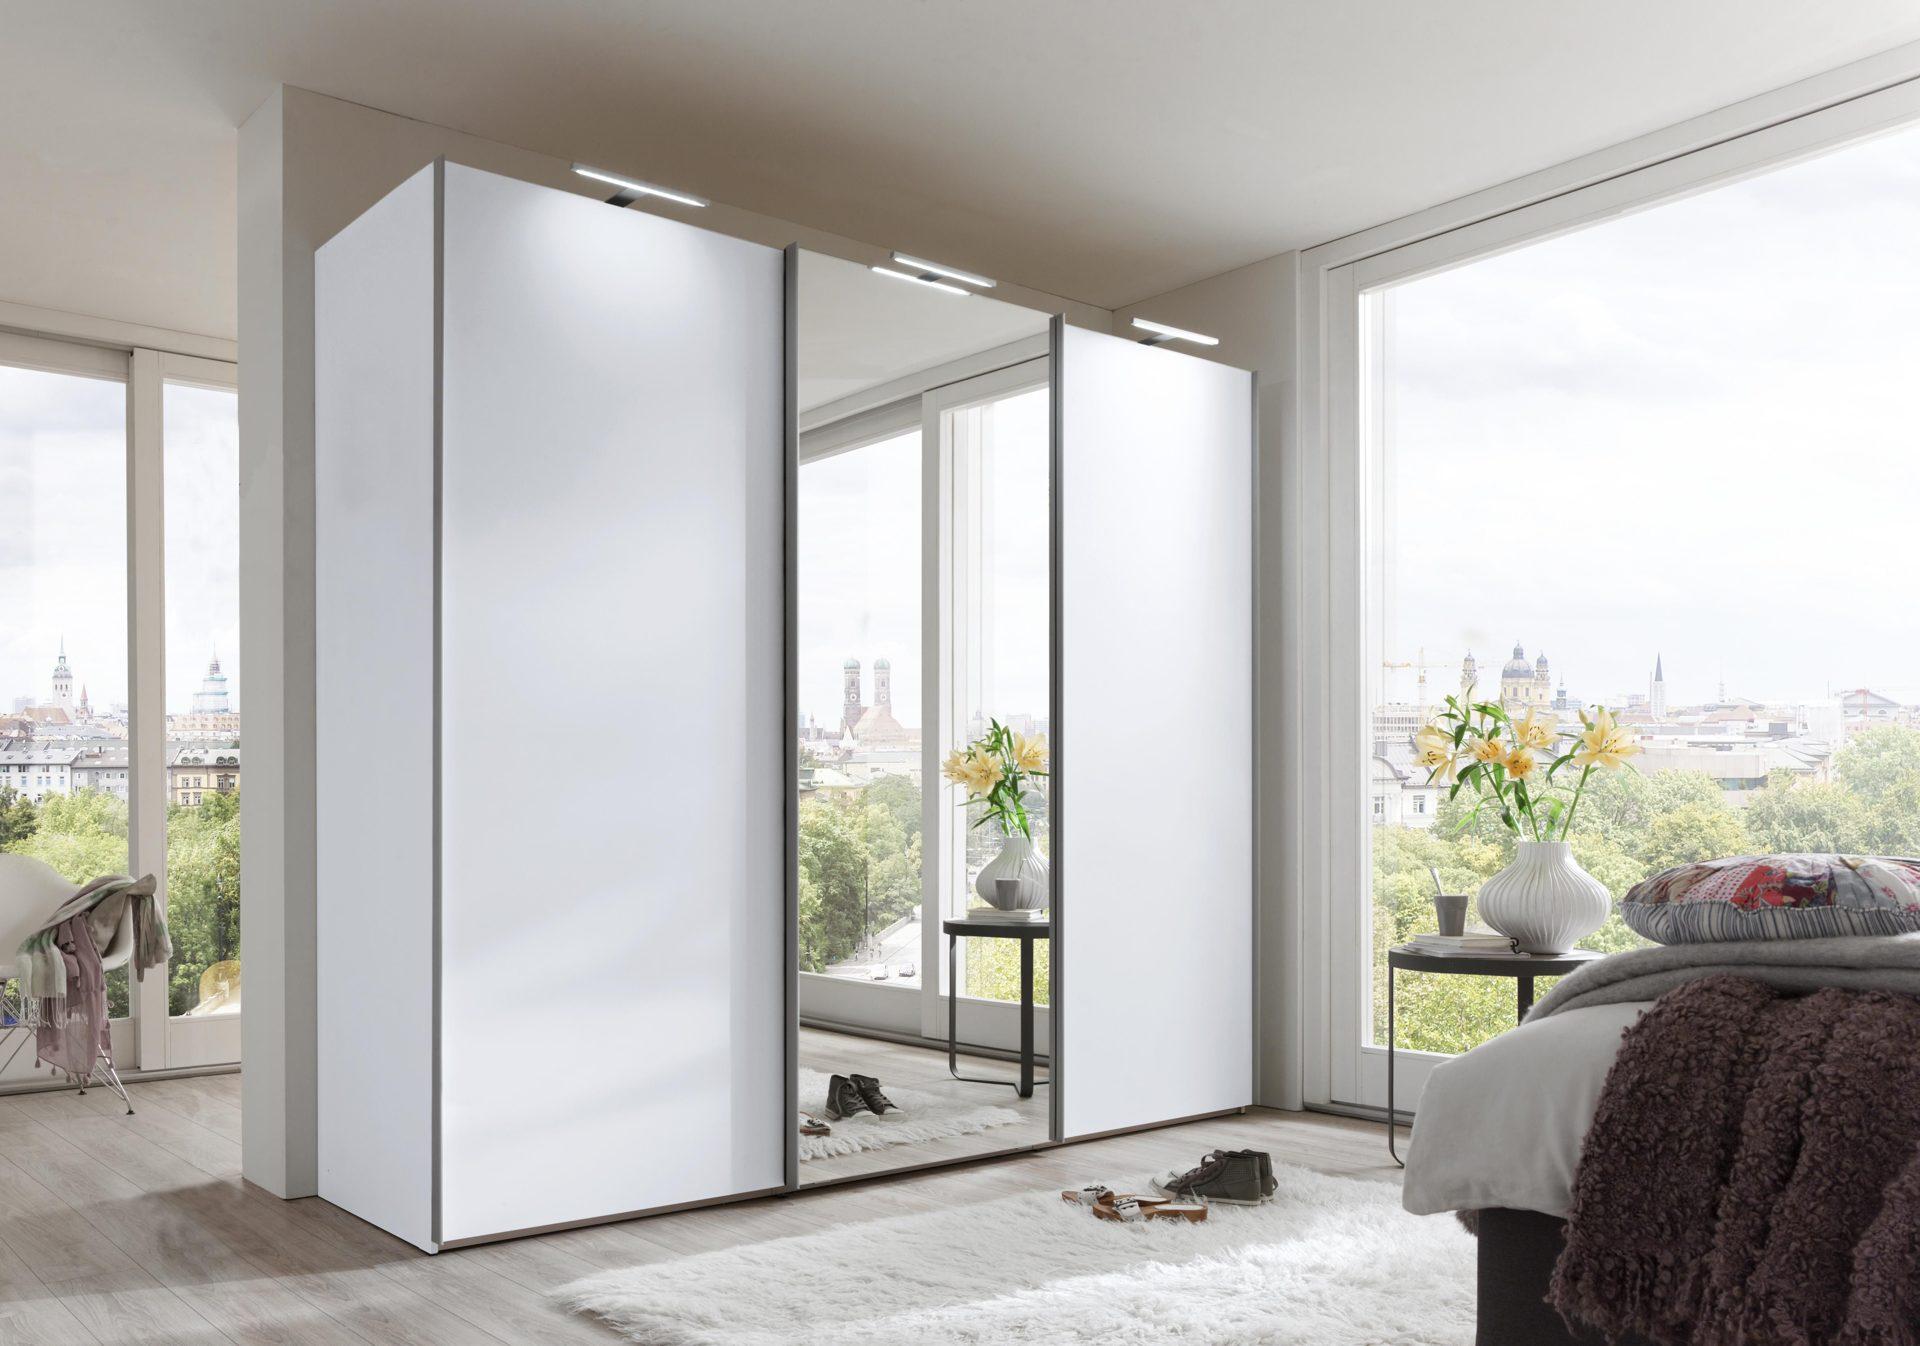 Beautiful Nolte Schlafzimmer Schränke Photos - House Design Ideas ...